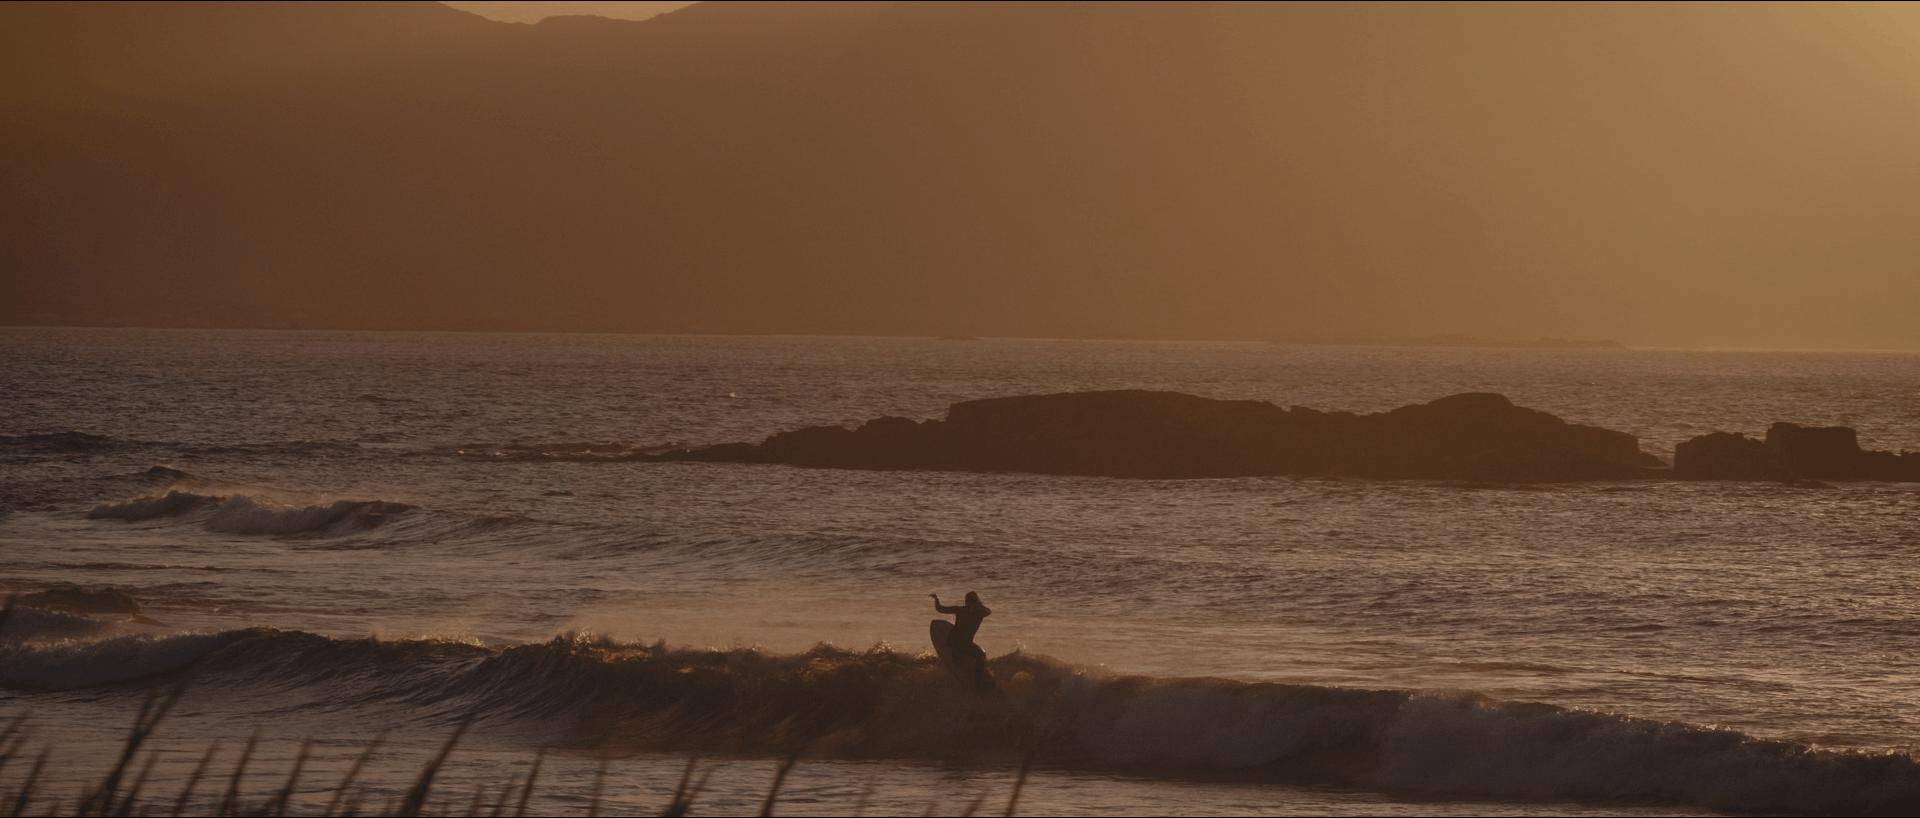 Anker gjør det han liker best. Foto: Mats Slaastad Birkelund fra Surfers of Lofoten episode 3